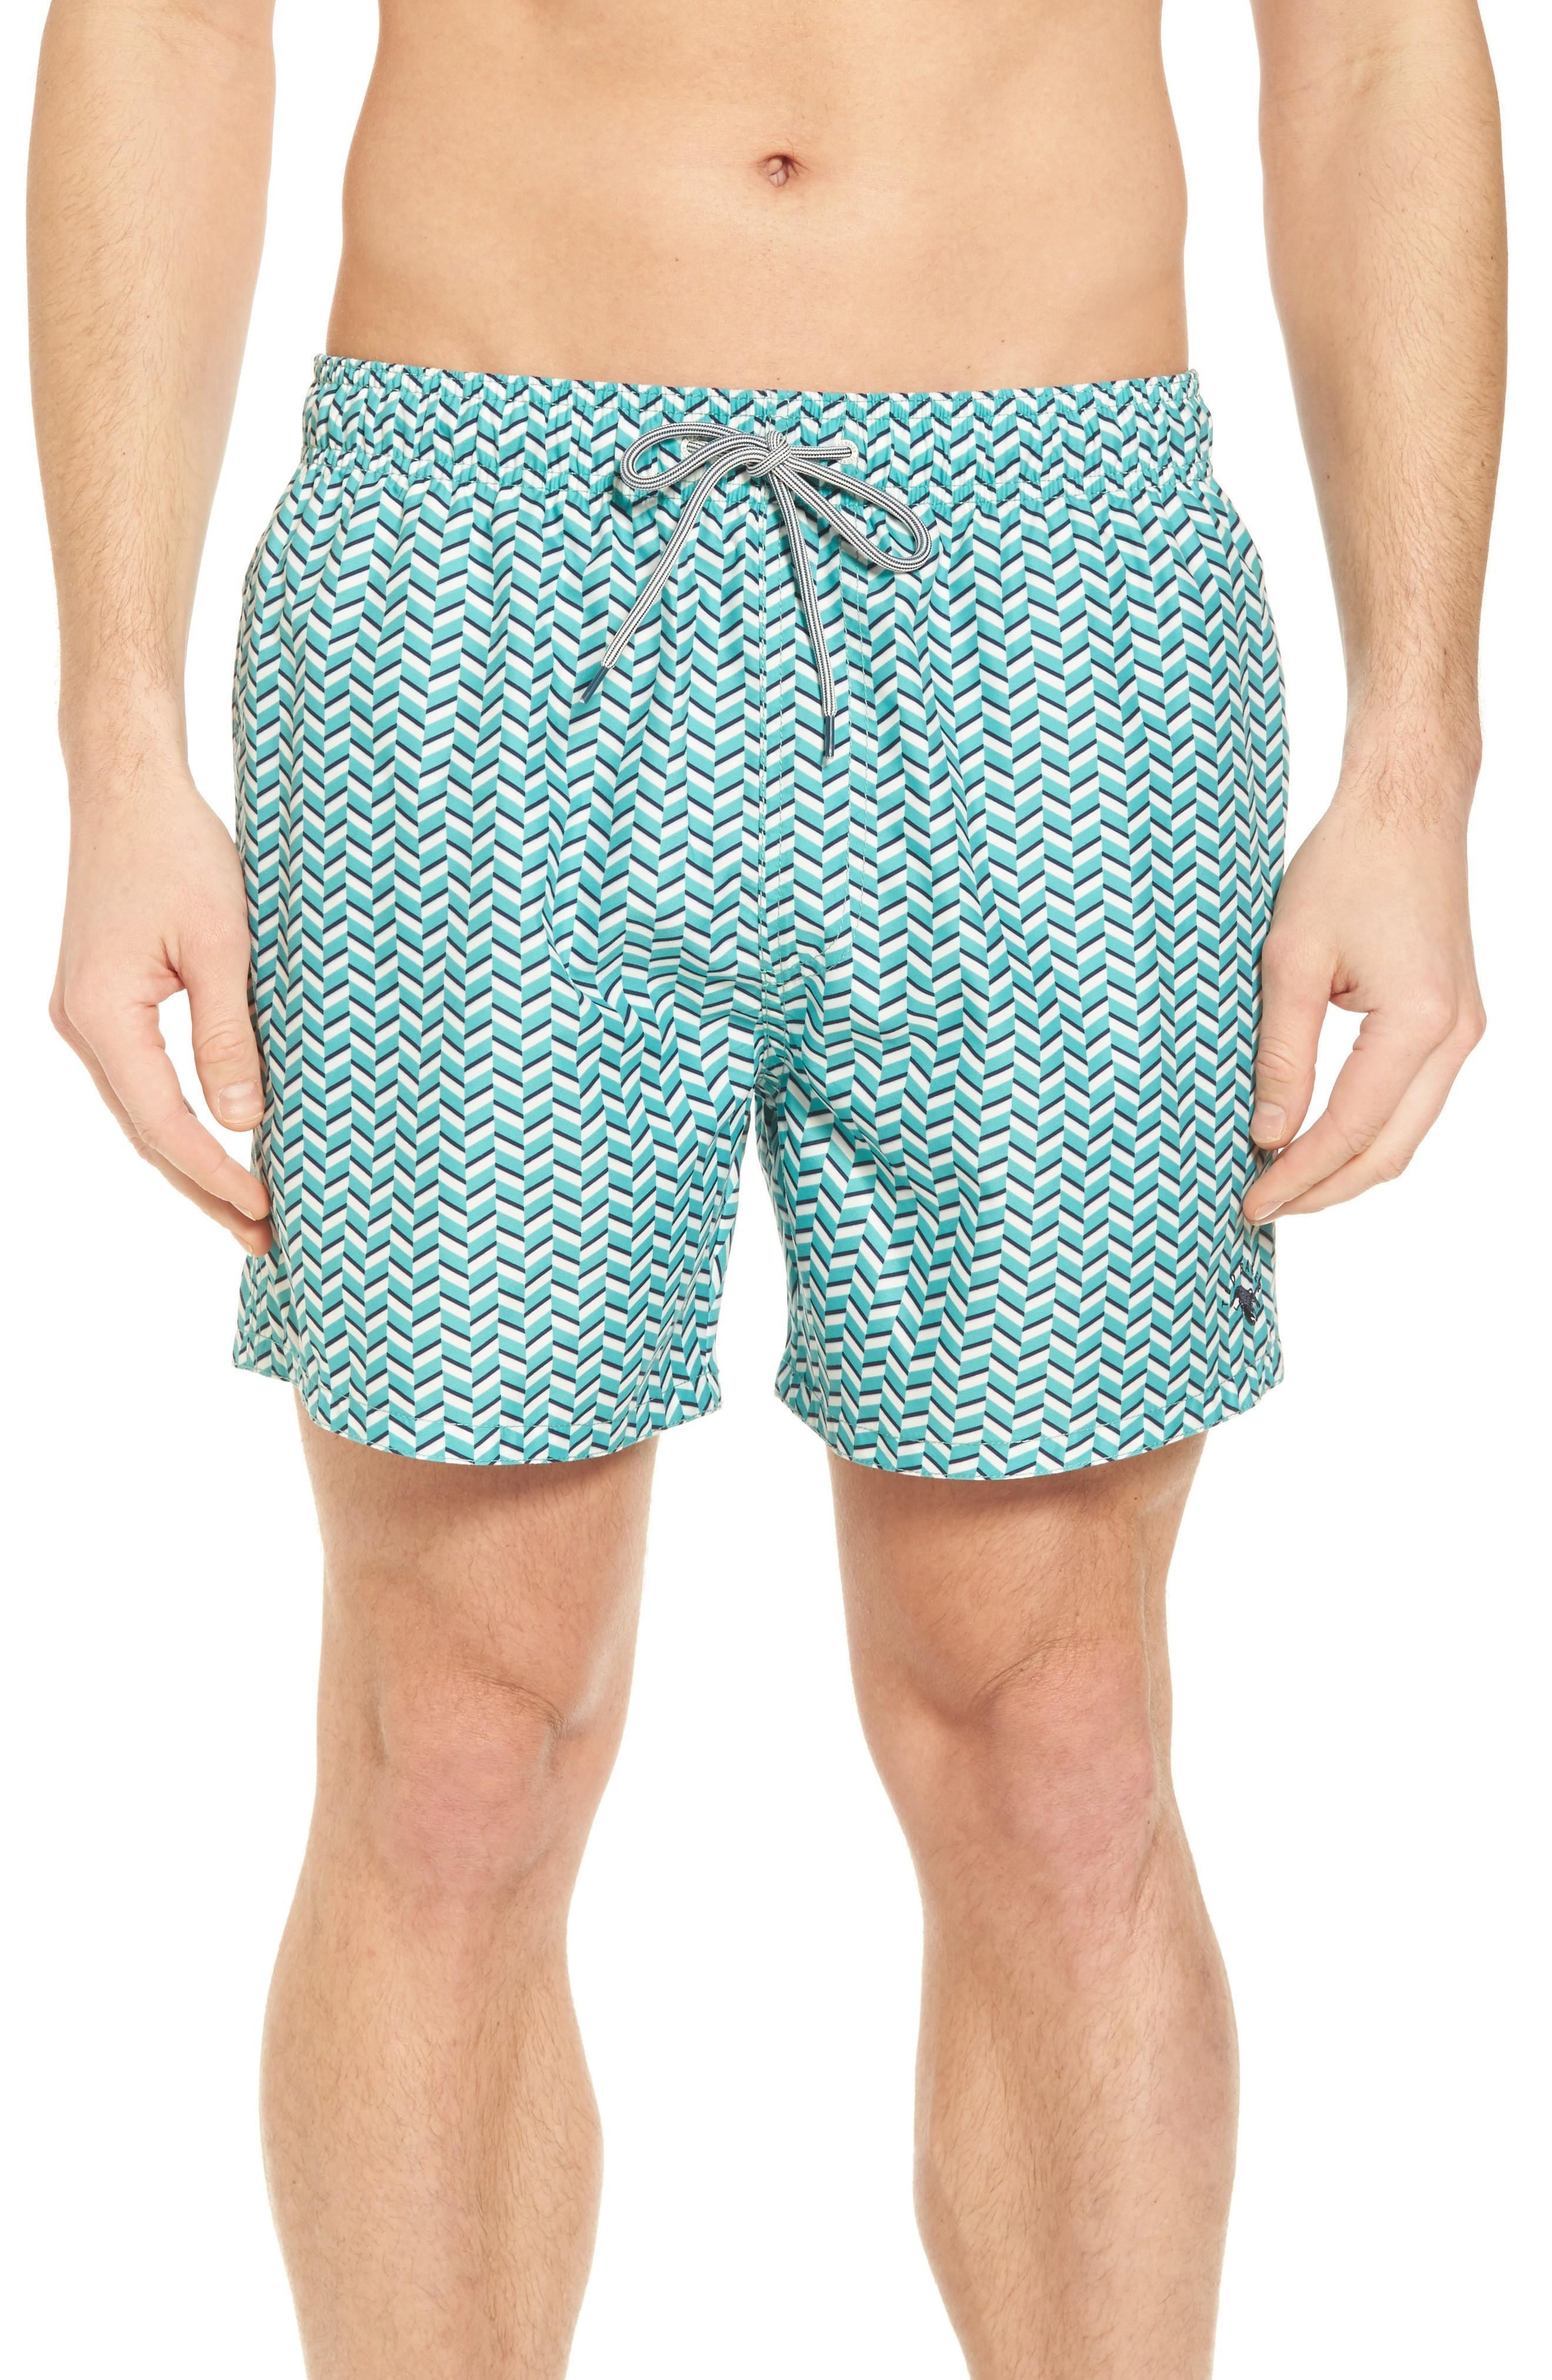 6732b5ce6f44 A striped drawstring and vibrant geometric pattern style crisp